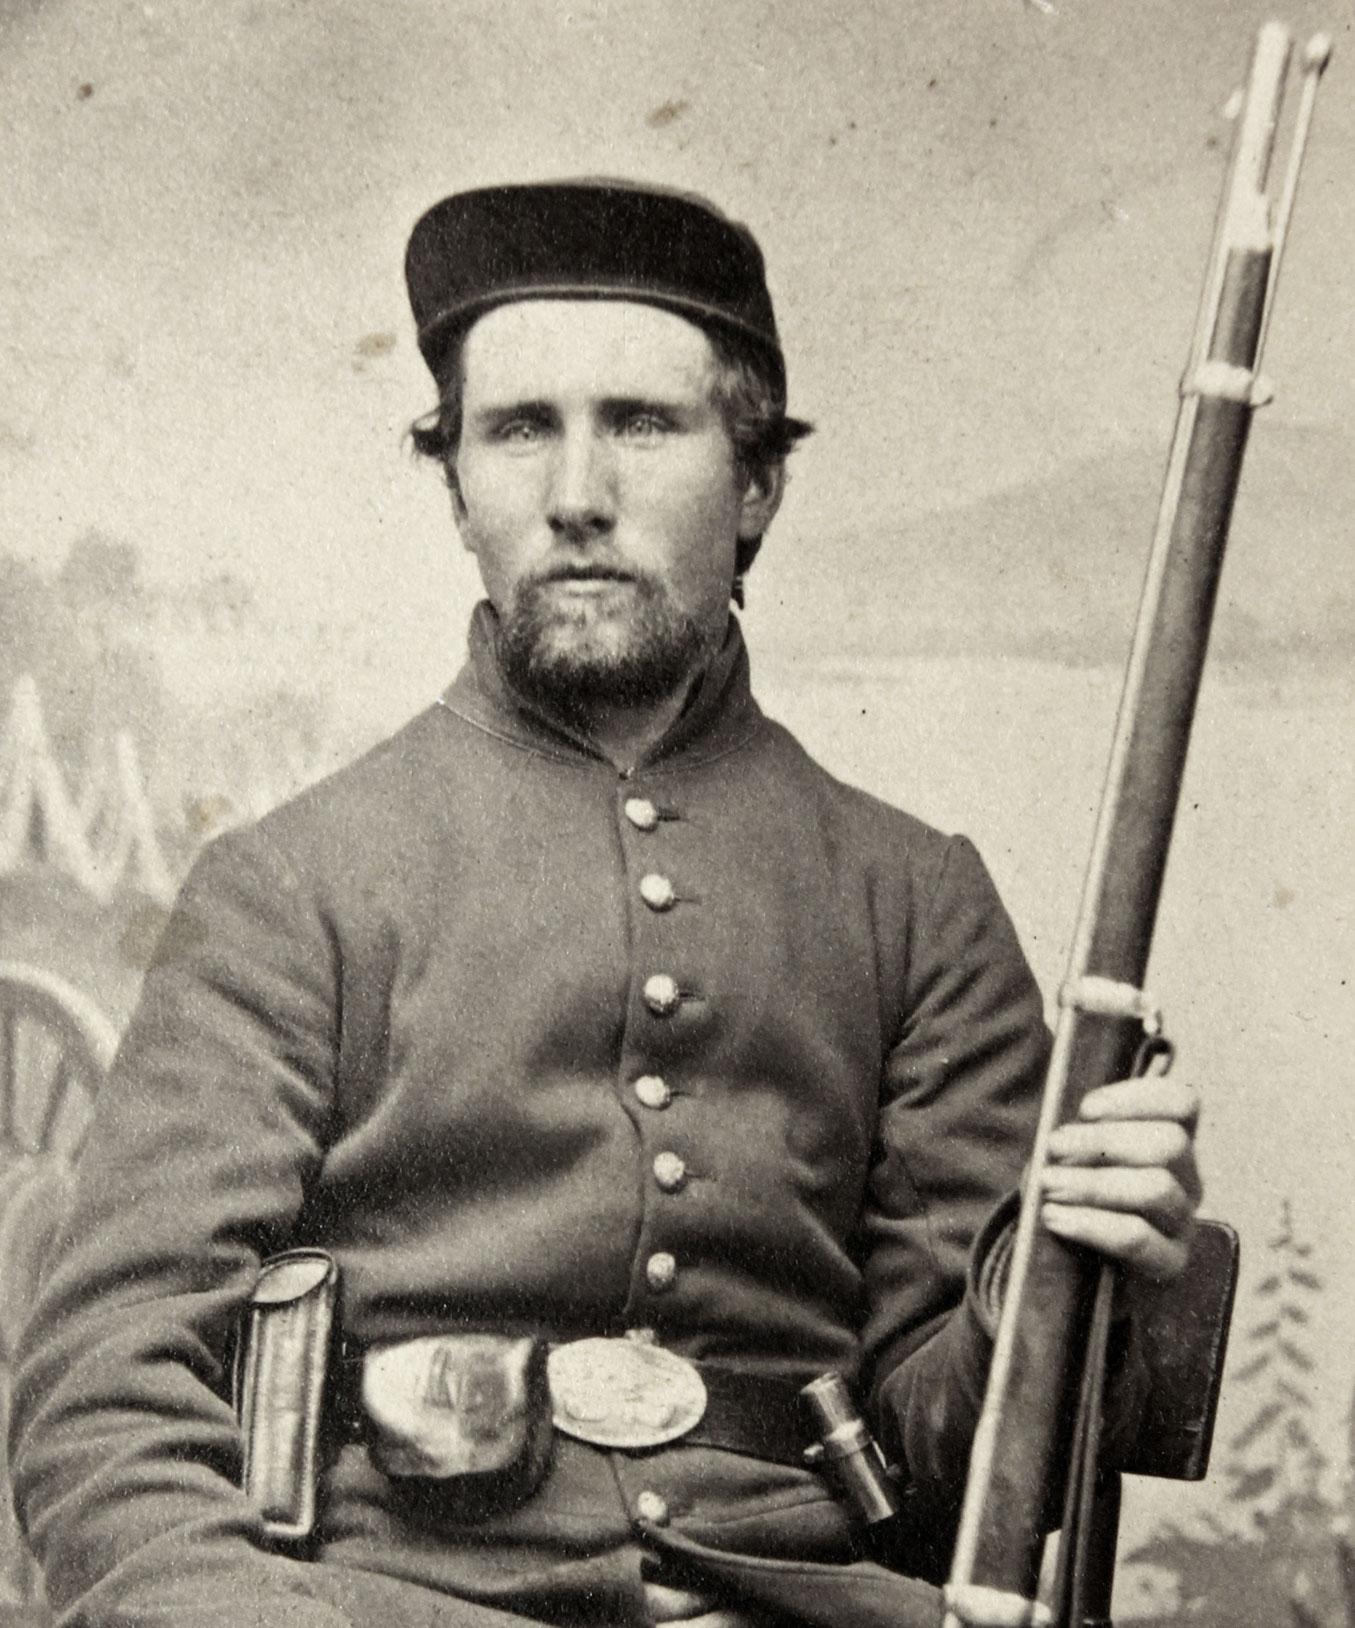 Unidentified federal infantryman. Buck Zaidel collection.